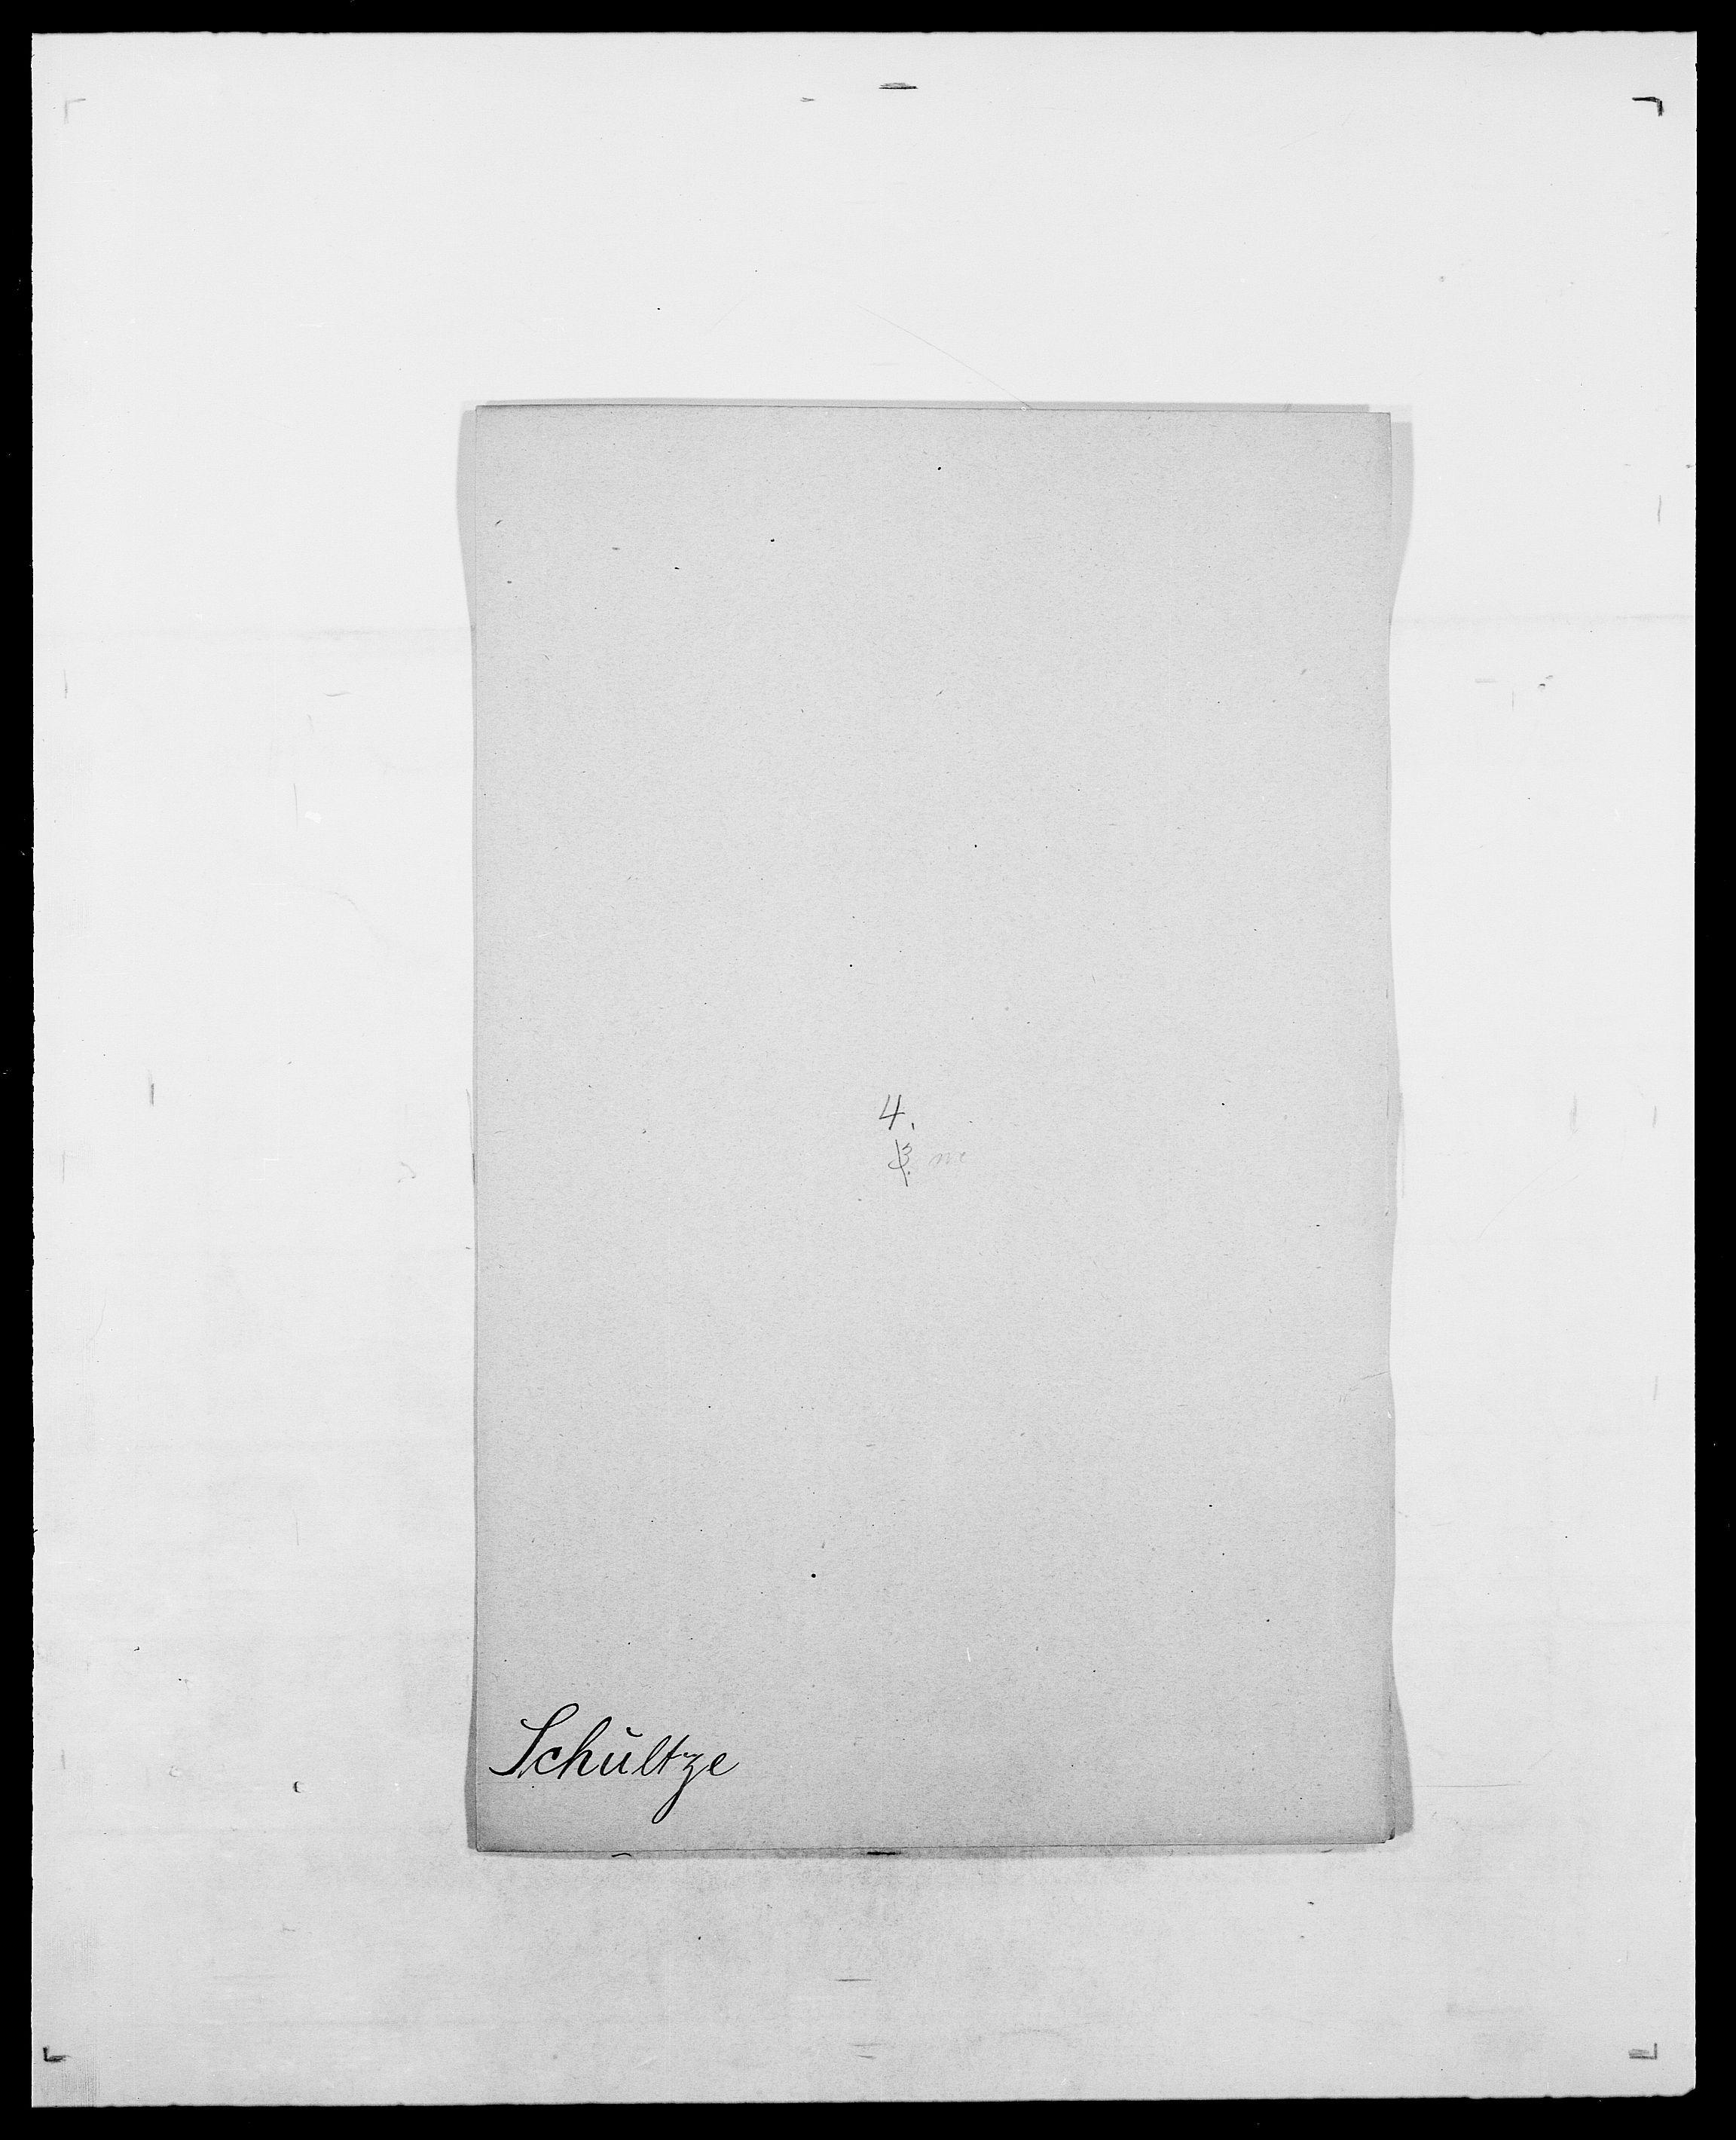 SAO, Delgobe, Charles Antoine - samling, D/Da/L0035: Schnabel - sjetman, s. 328